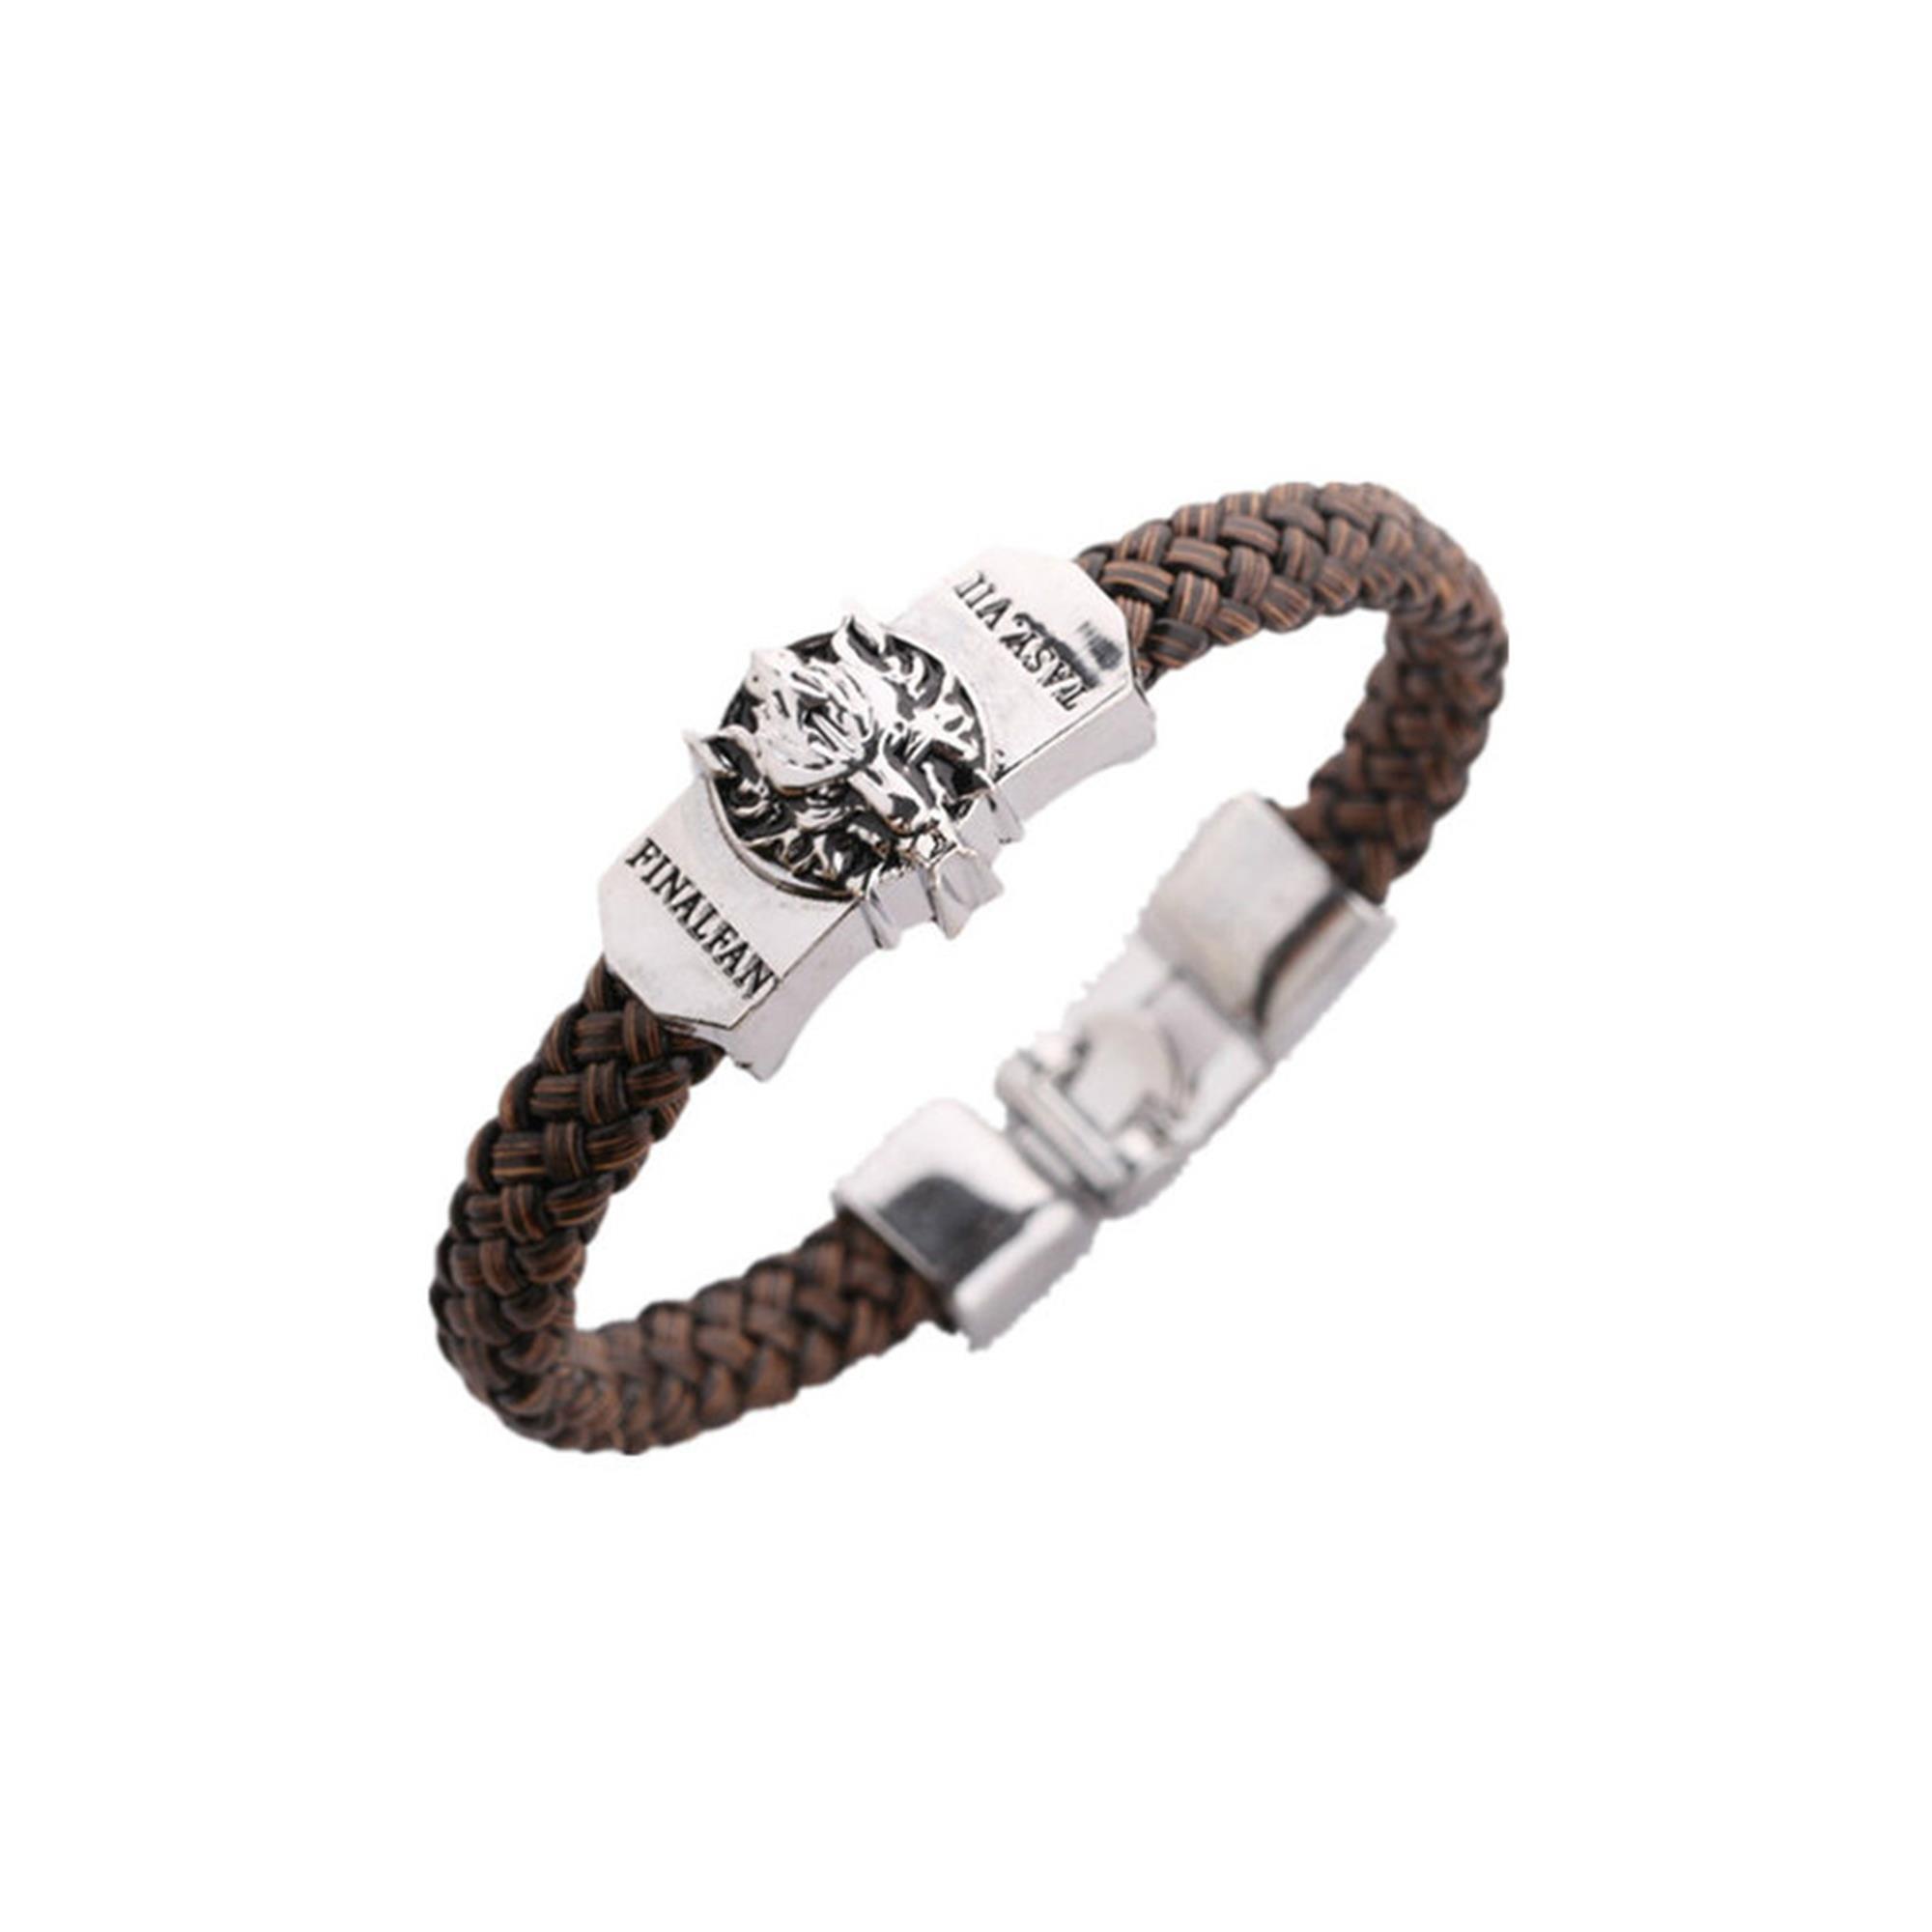 Athena Brand Game Final Fantasy VII Logo Leather Braided Bracelet In Gift Box